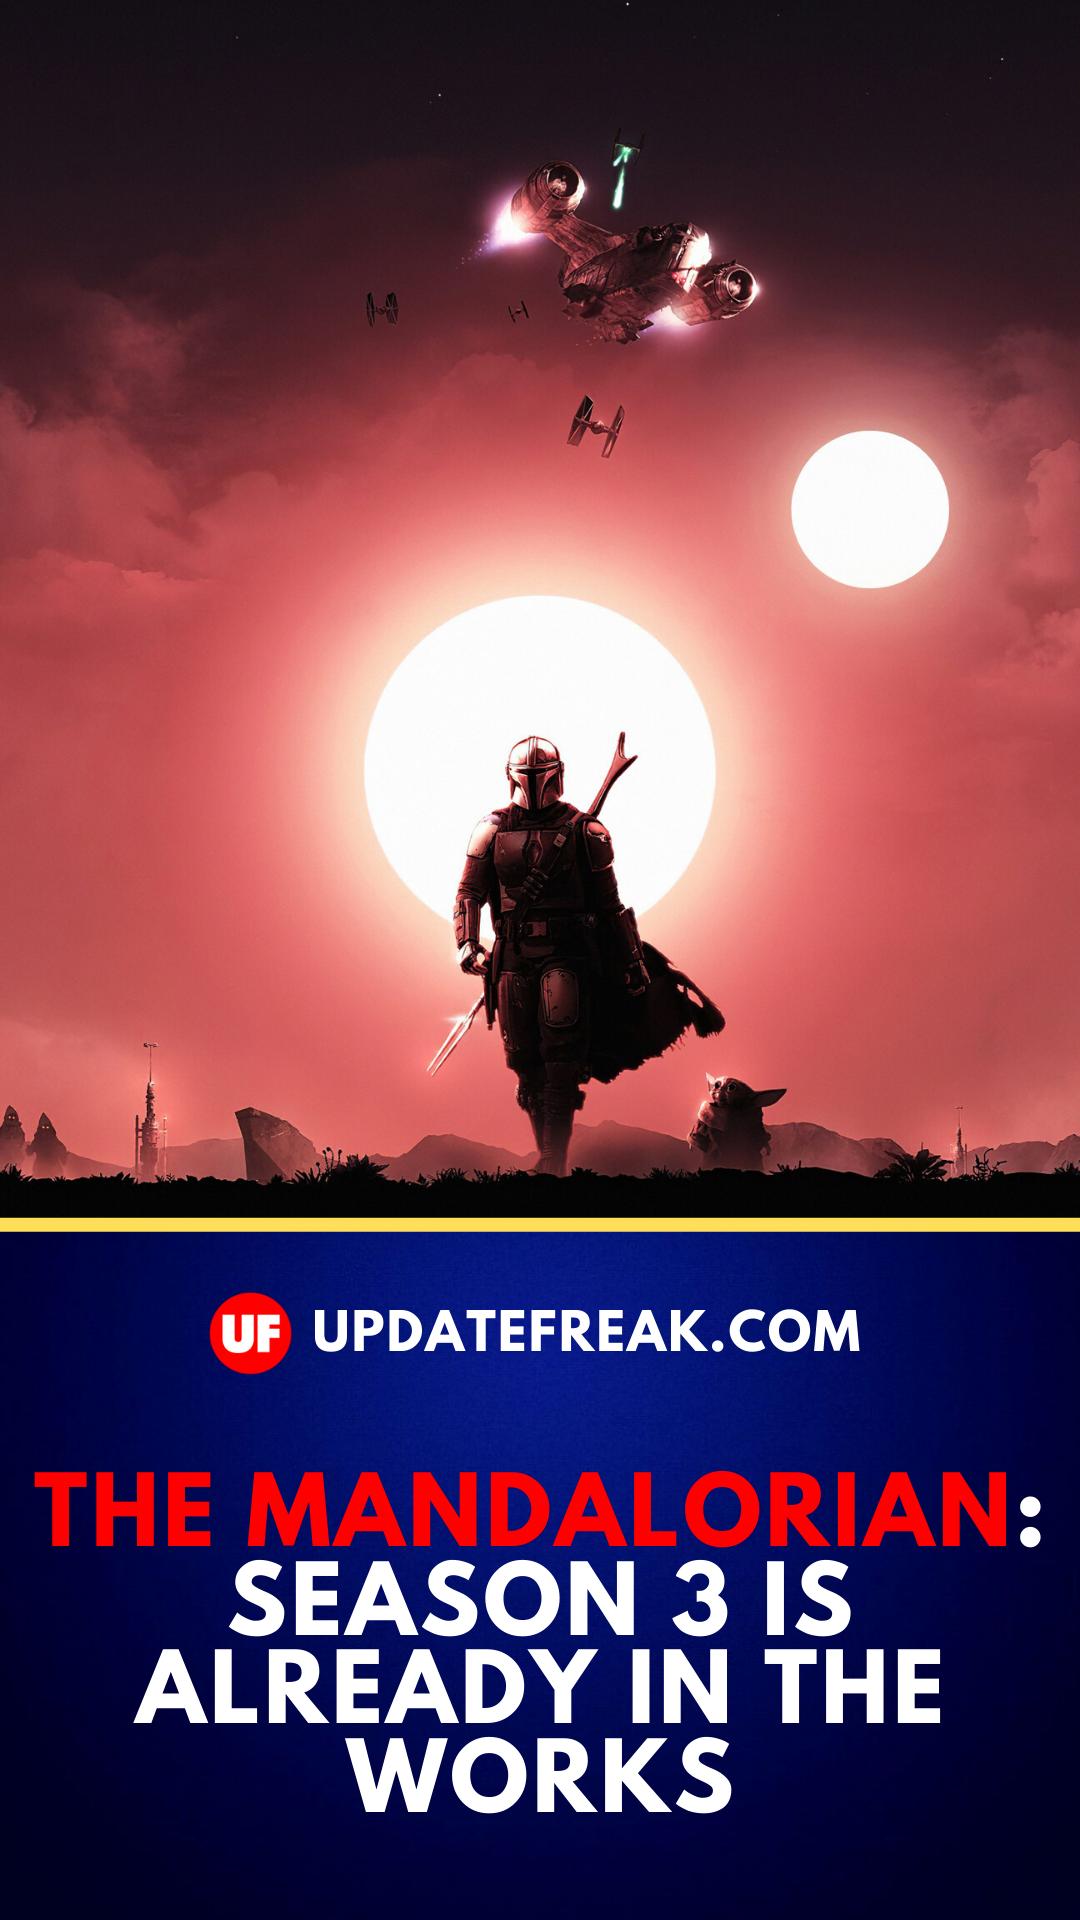 The Mandalorian Season 3 Is Already In The Works In 2020 Disney Plus Mandalorian Yoda Species